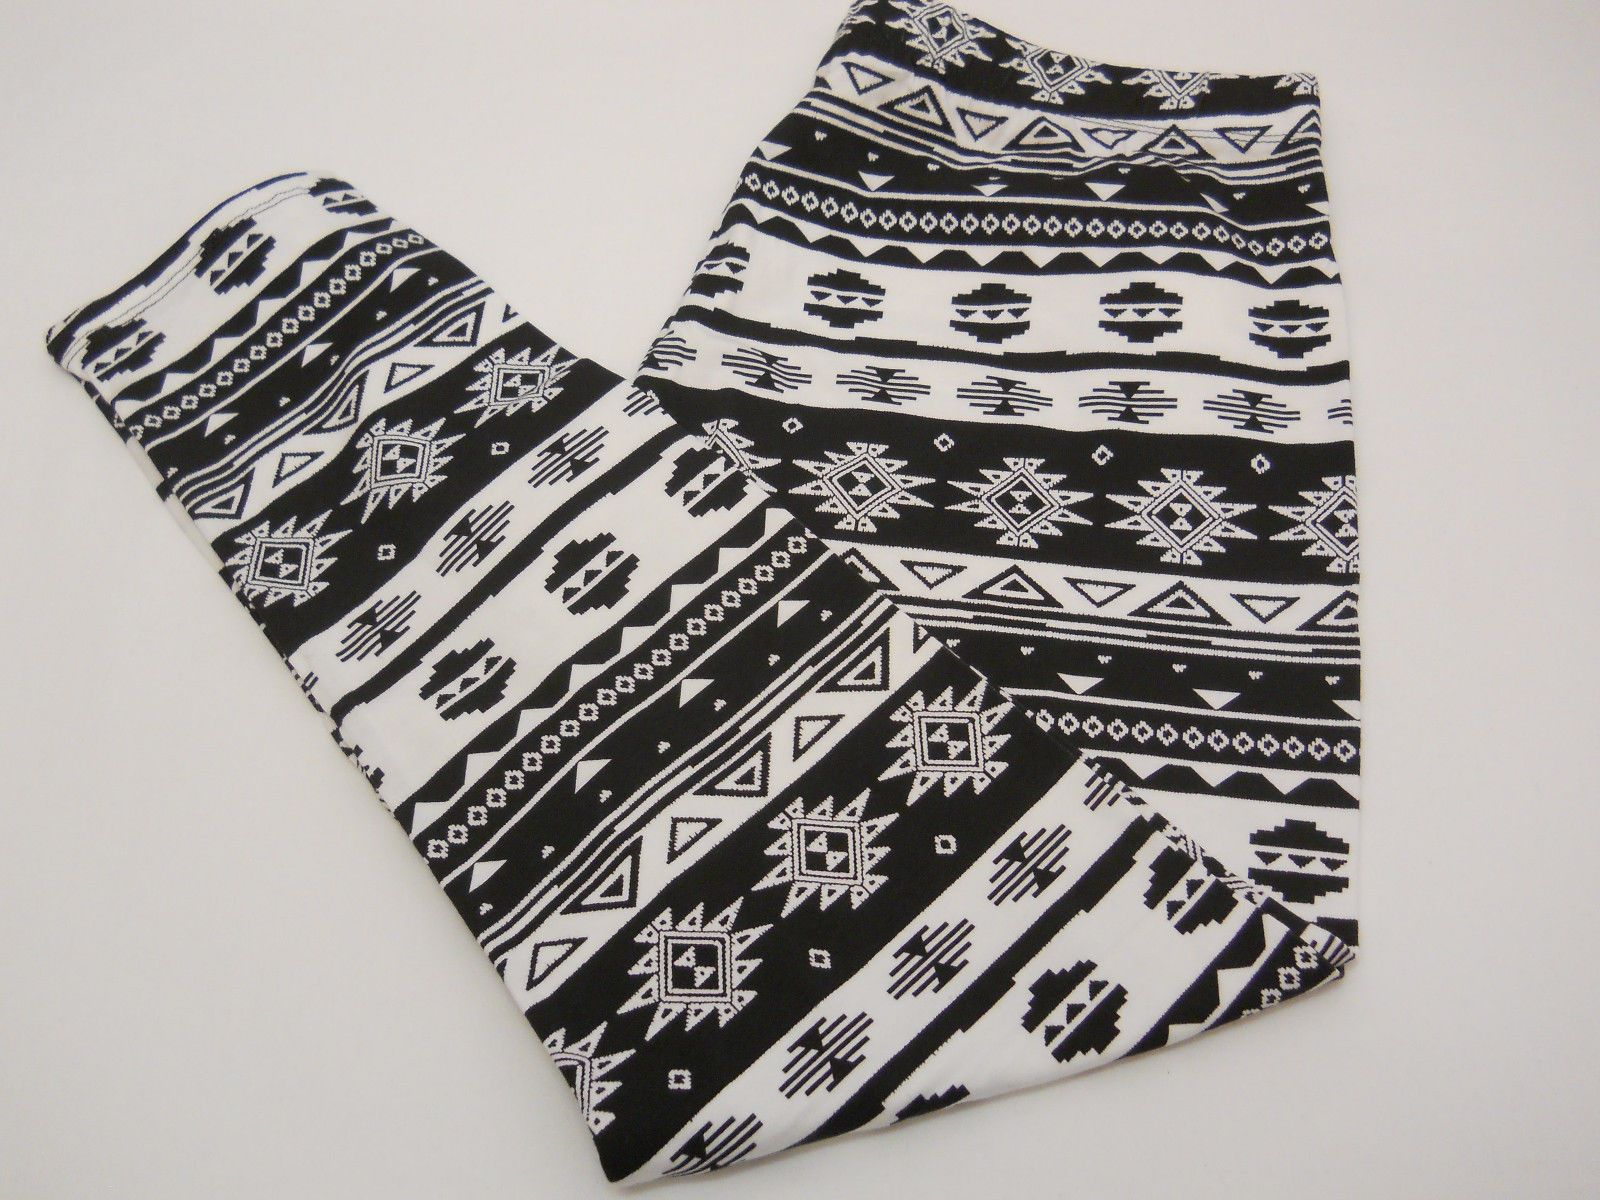 e72a97cdde6cbc SIZE XL Womens Ankle Leggings NO BOUNDARIES Tribal Print Skinny Legs Inseam  28 For Sale - Item #1645972